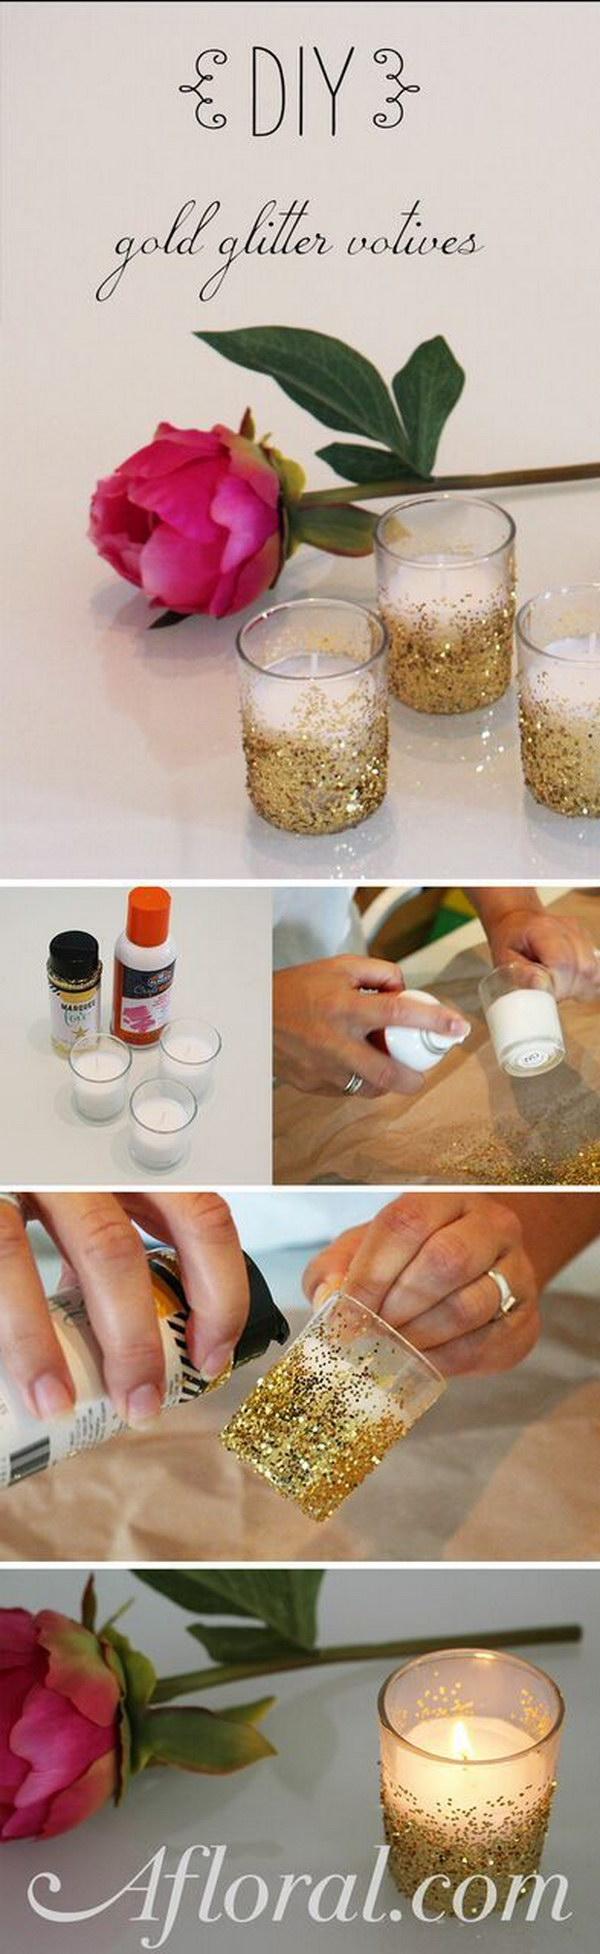 6 DIY Glitter Voitive